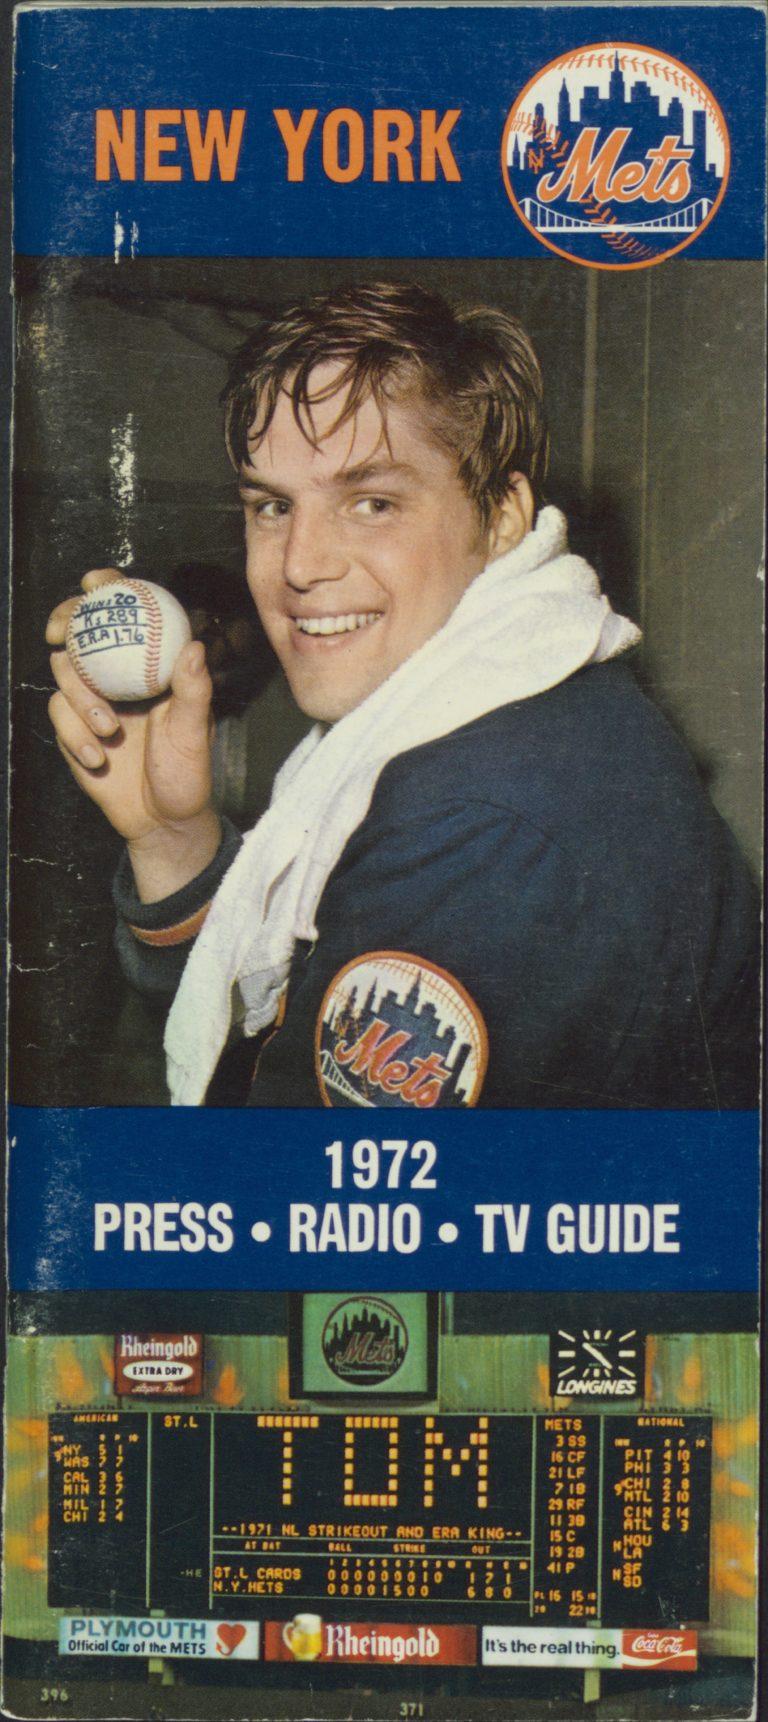 1972 Press-Radio-TV Guide Featuring Tom Seaver